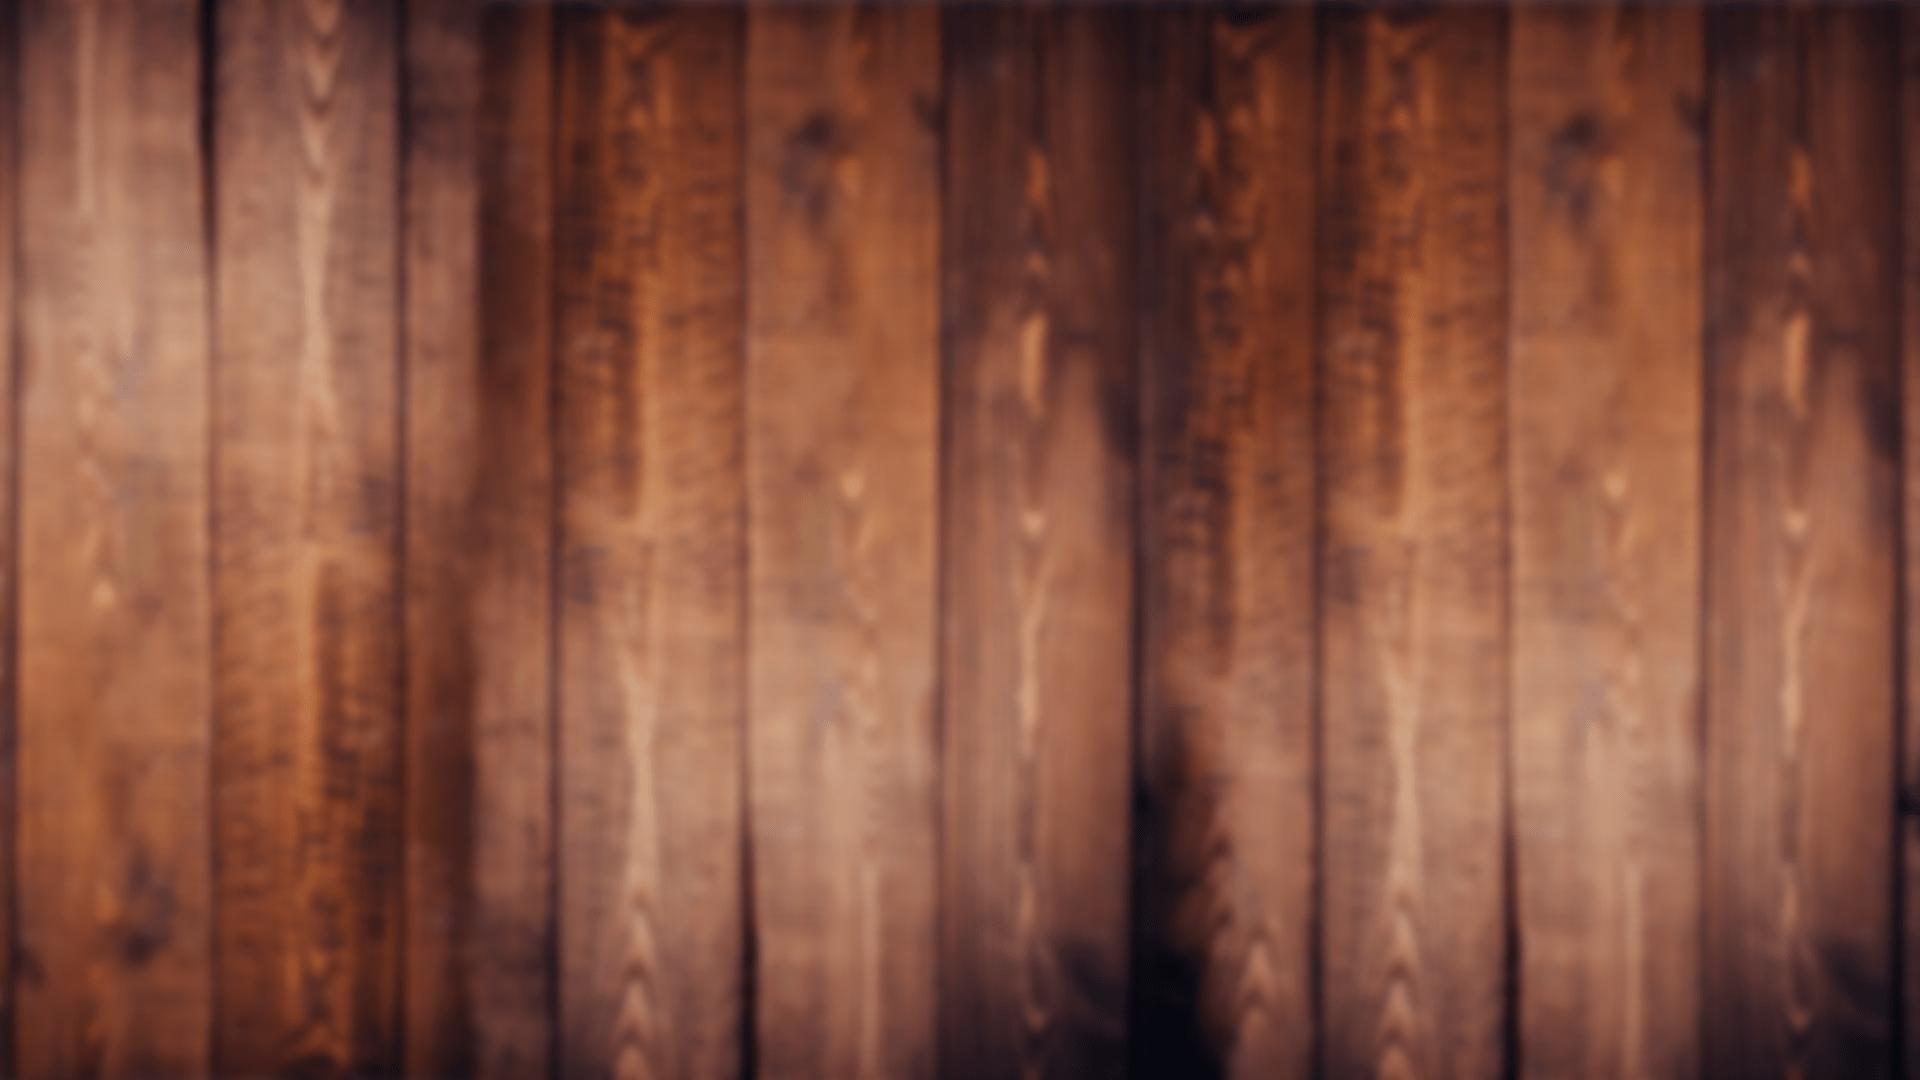 Wood,                Stain,                Wall,                Texture,                Hardwood,                Plank,                Flooring,                Floor,                Computer,                Wallpaper,                Black,                Red,                 Free Image